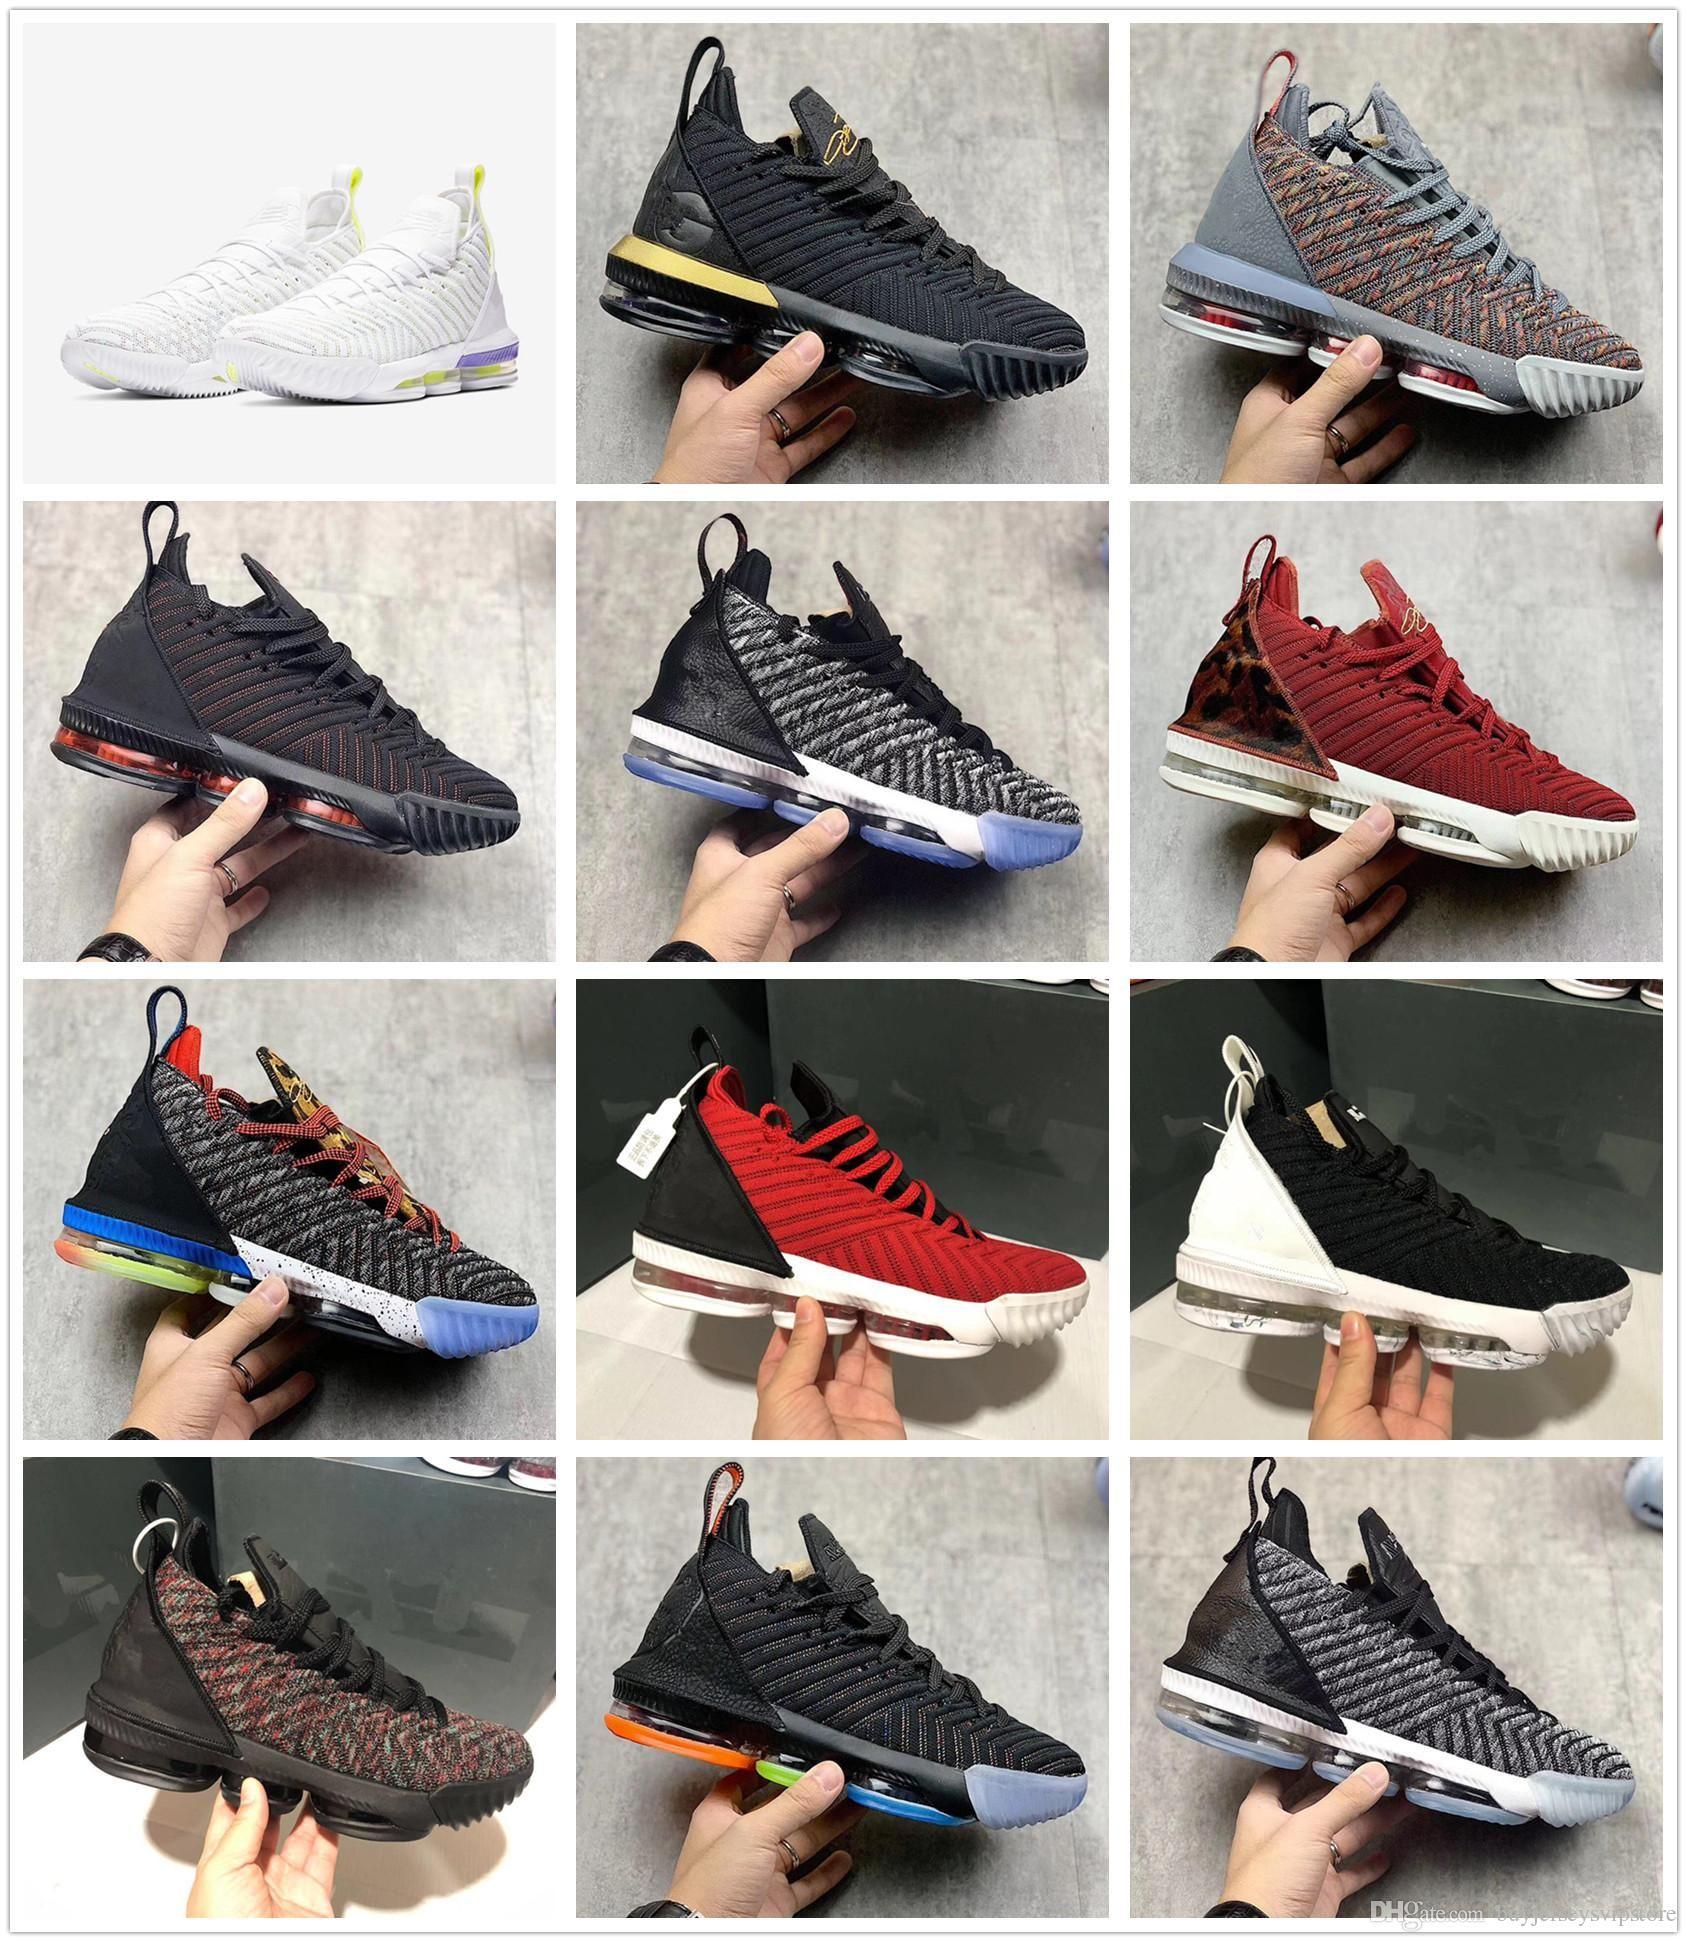 new style e0629 70067 LeBron shoes james 16 I m King LeBron 16 BuzzsLightyeas 1 Mid Lakers size  us7-us12